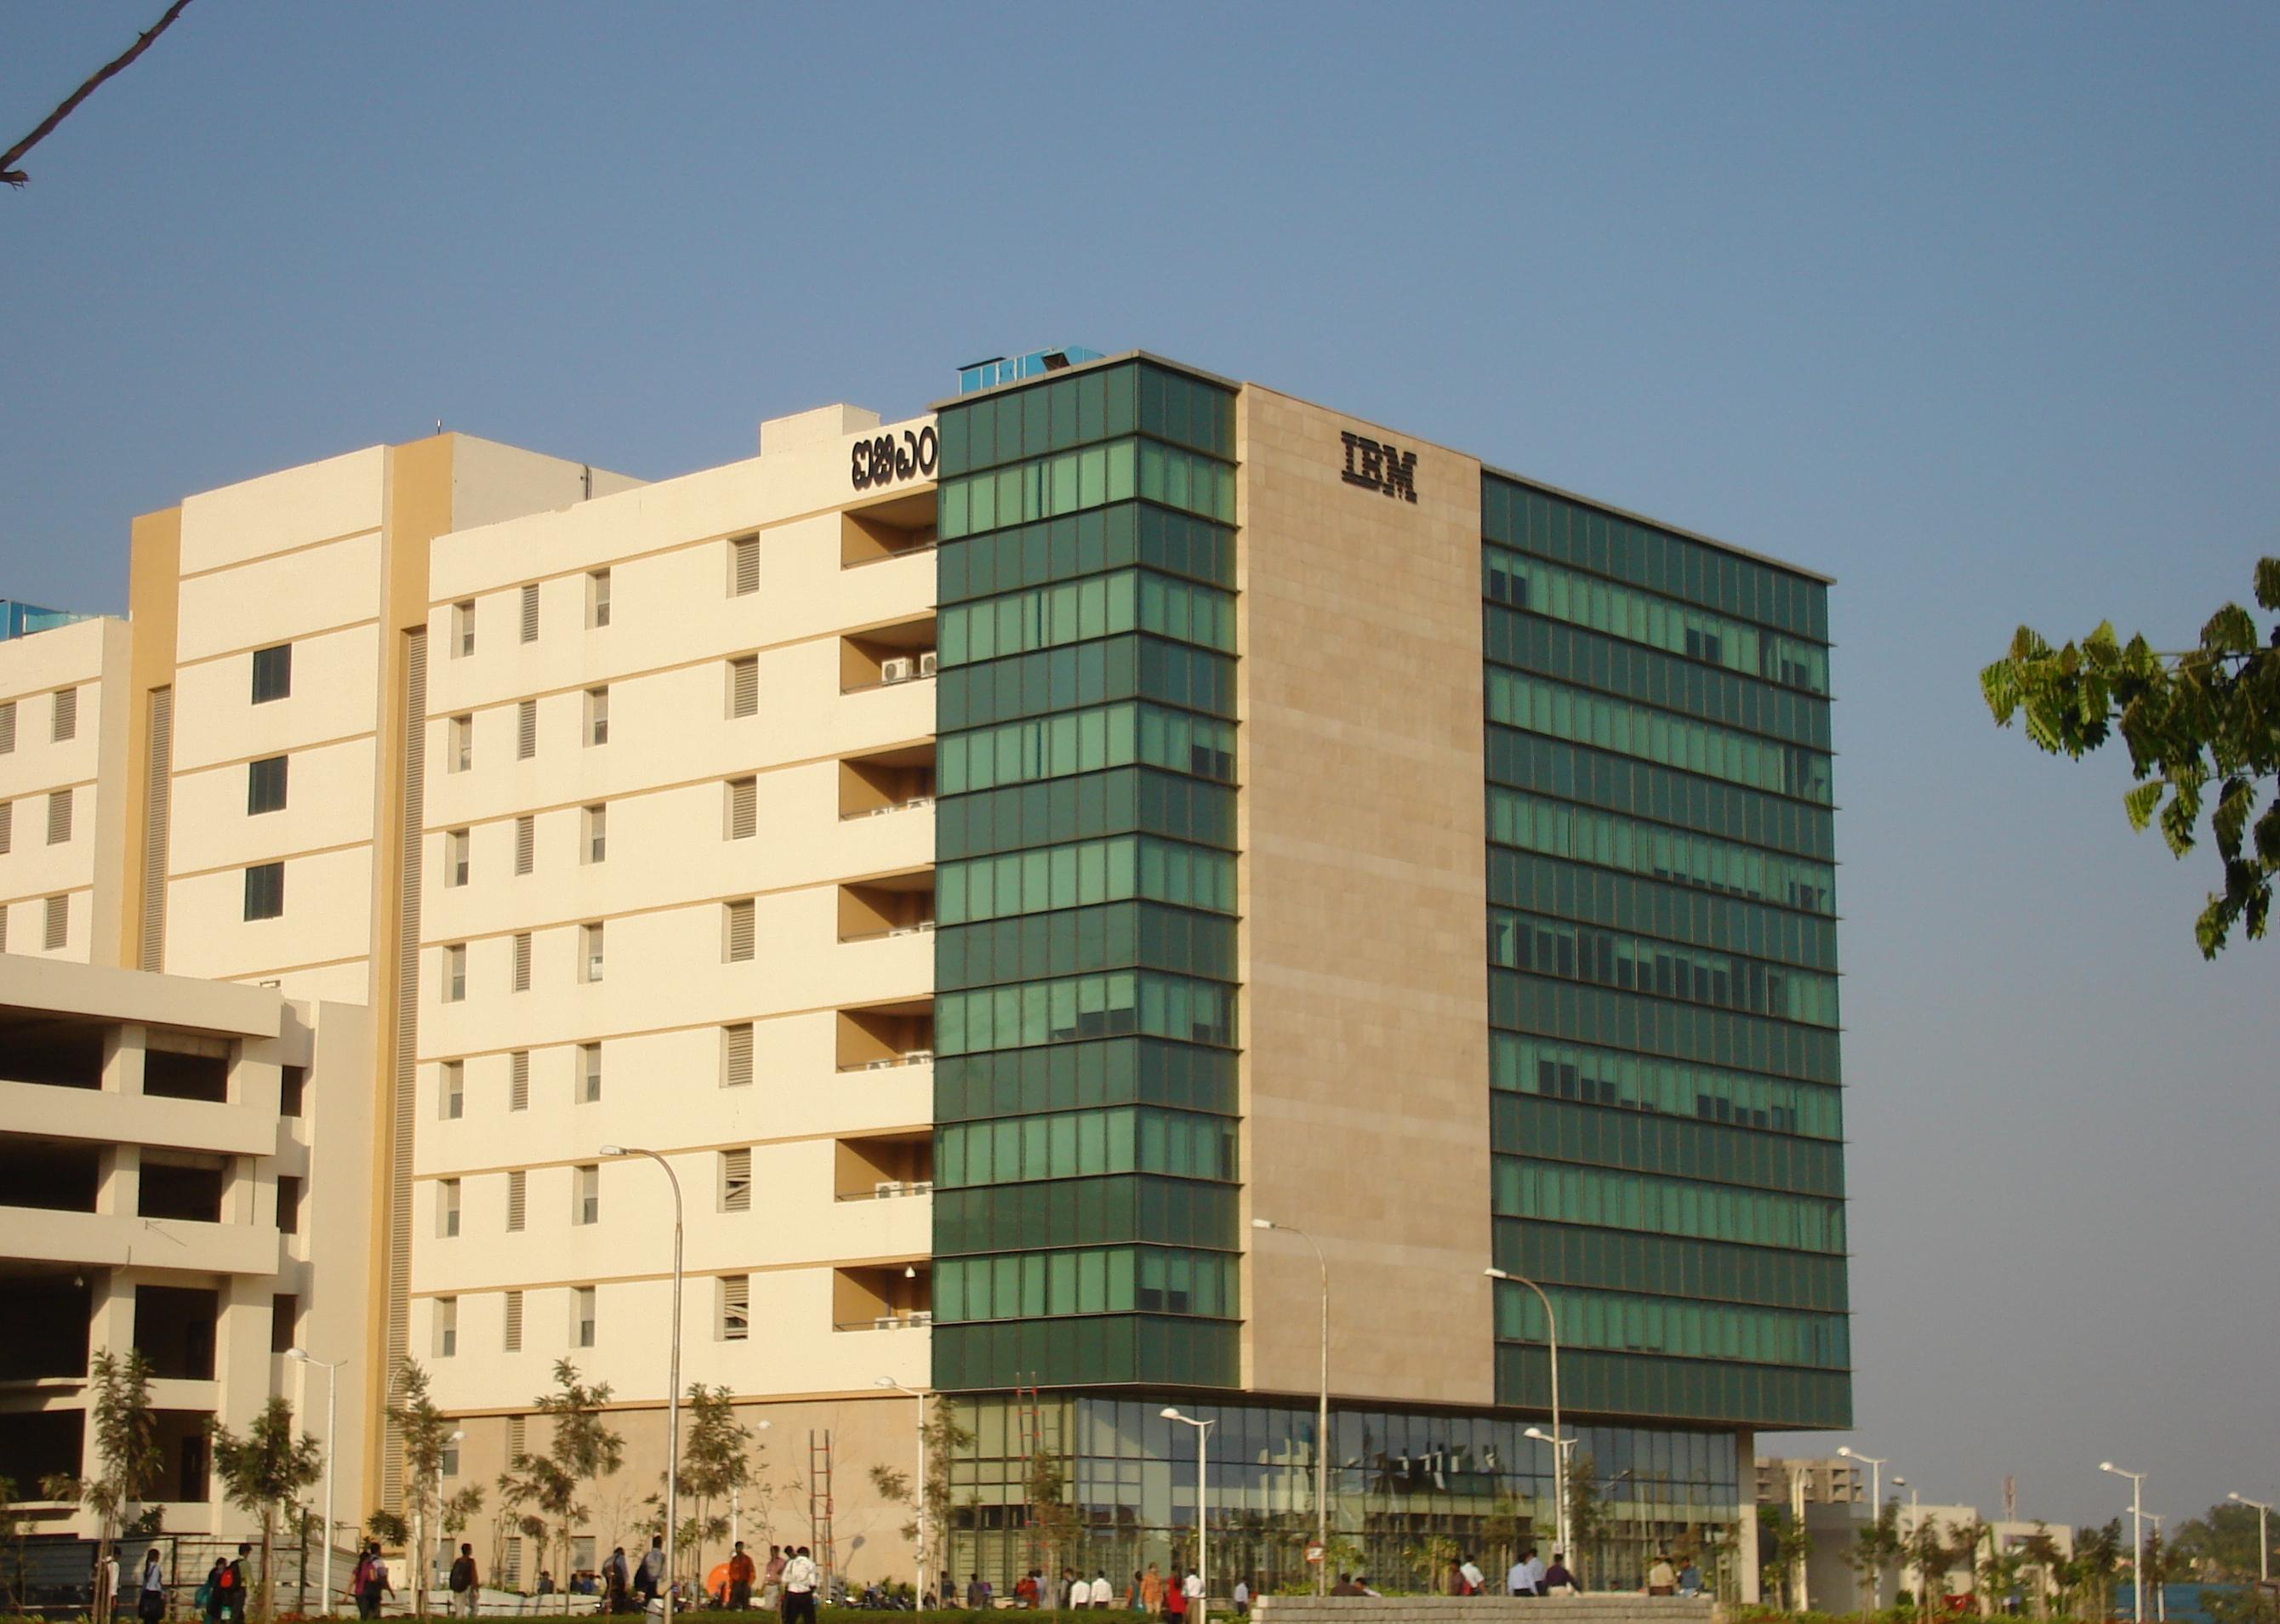 pvt ltd company rules in india pdf